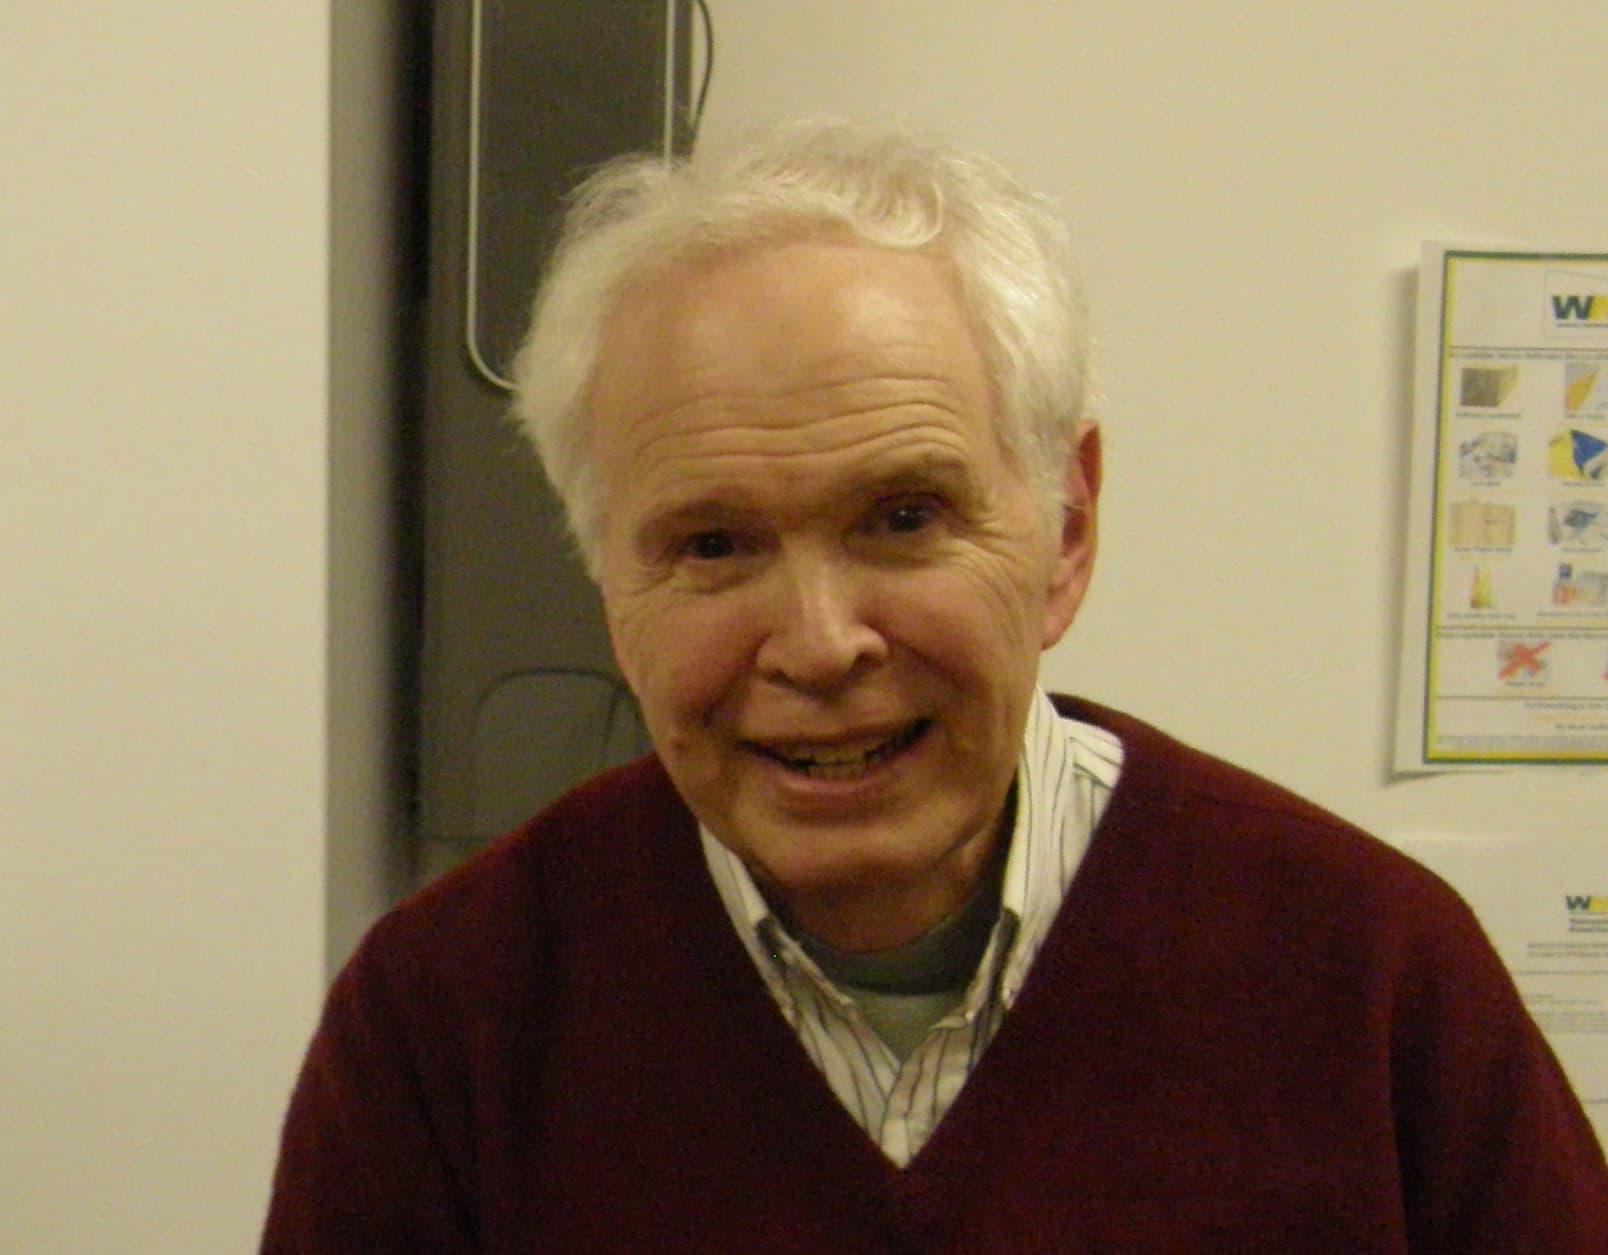 Peter deLeon